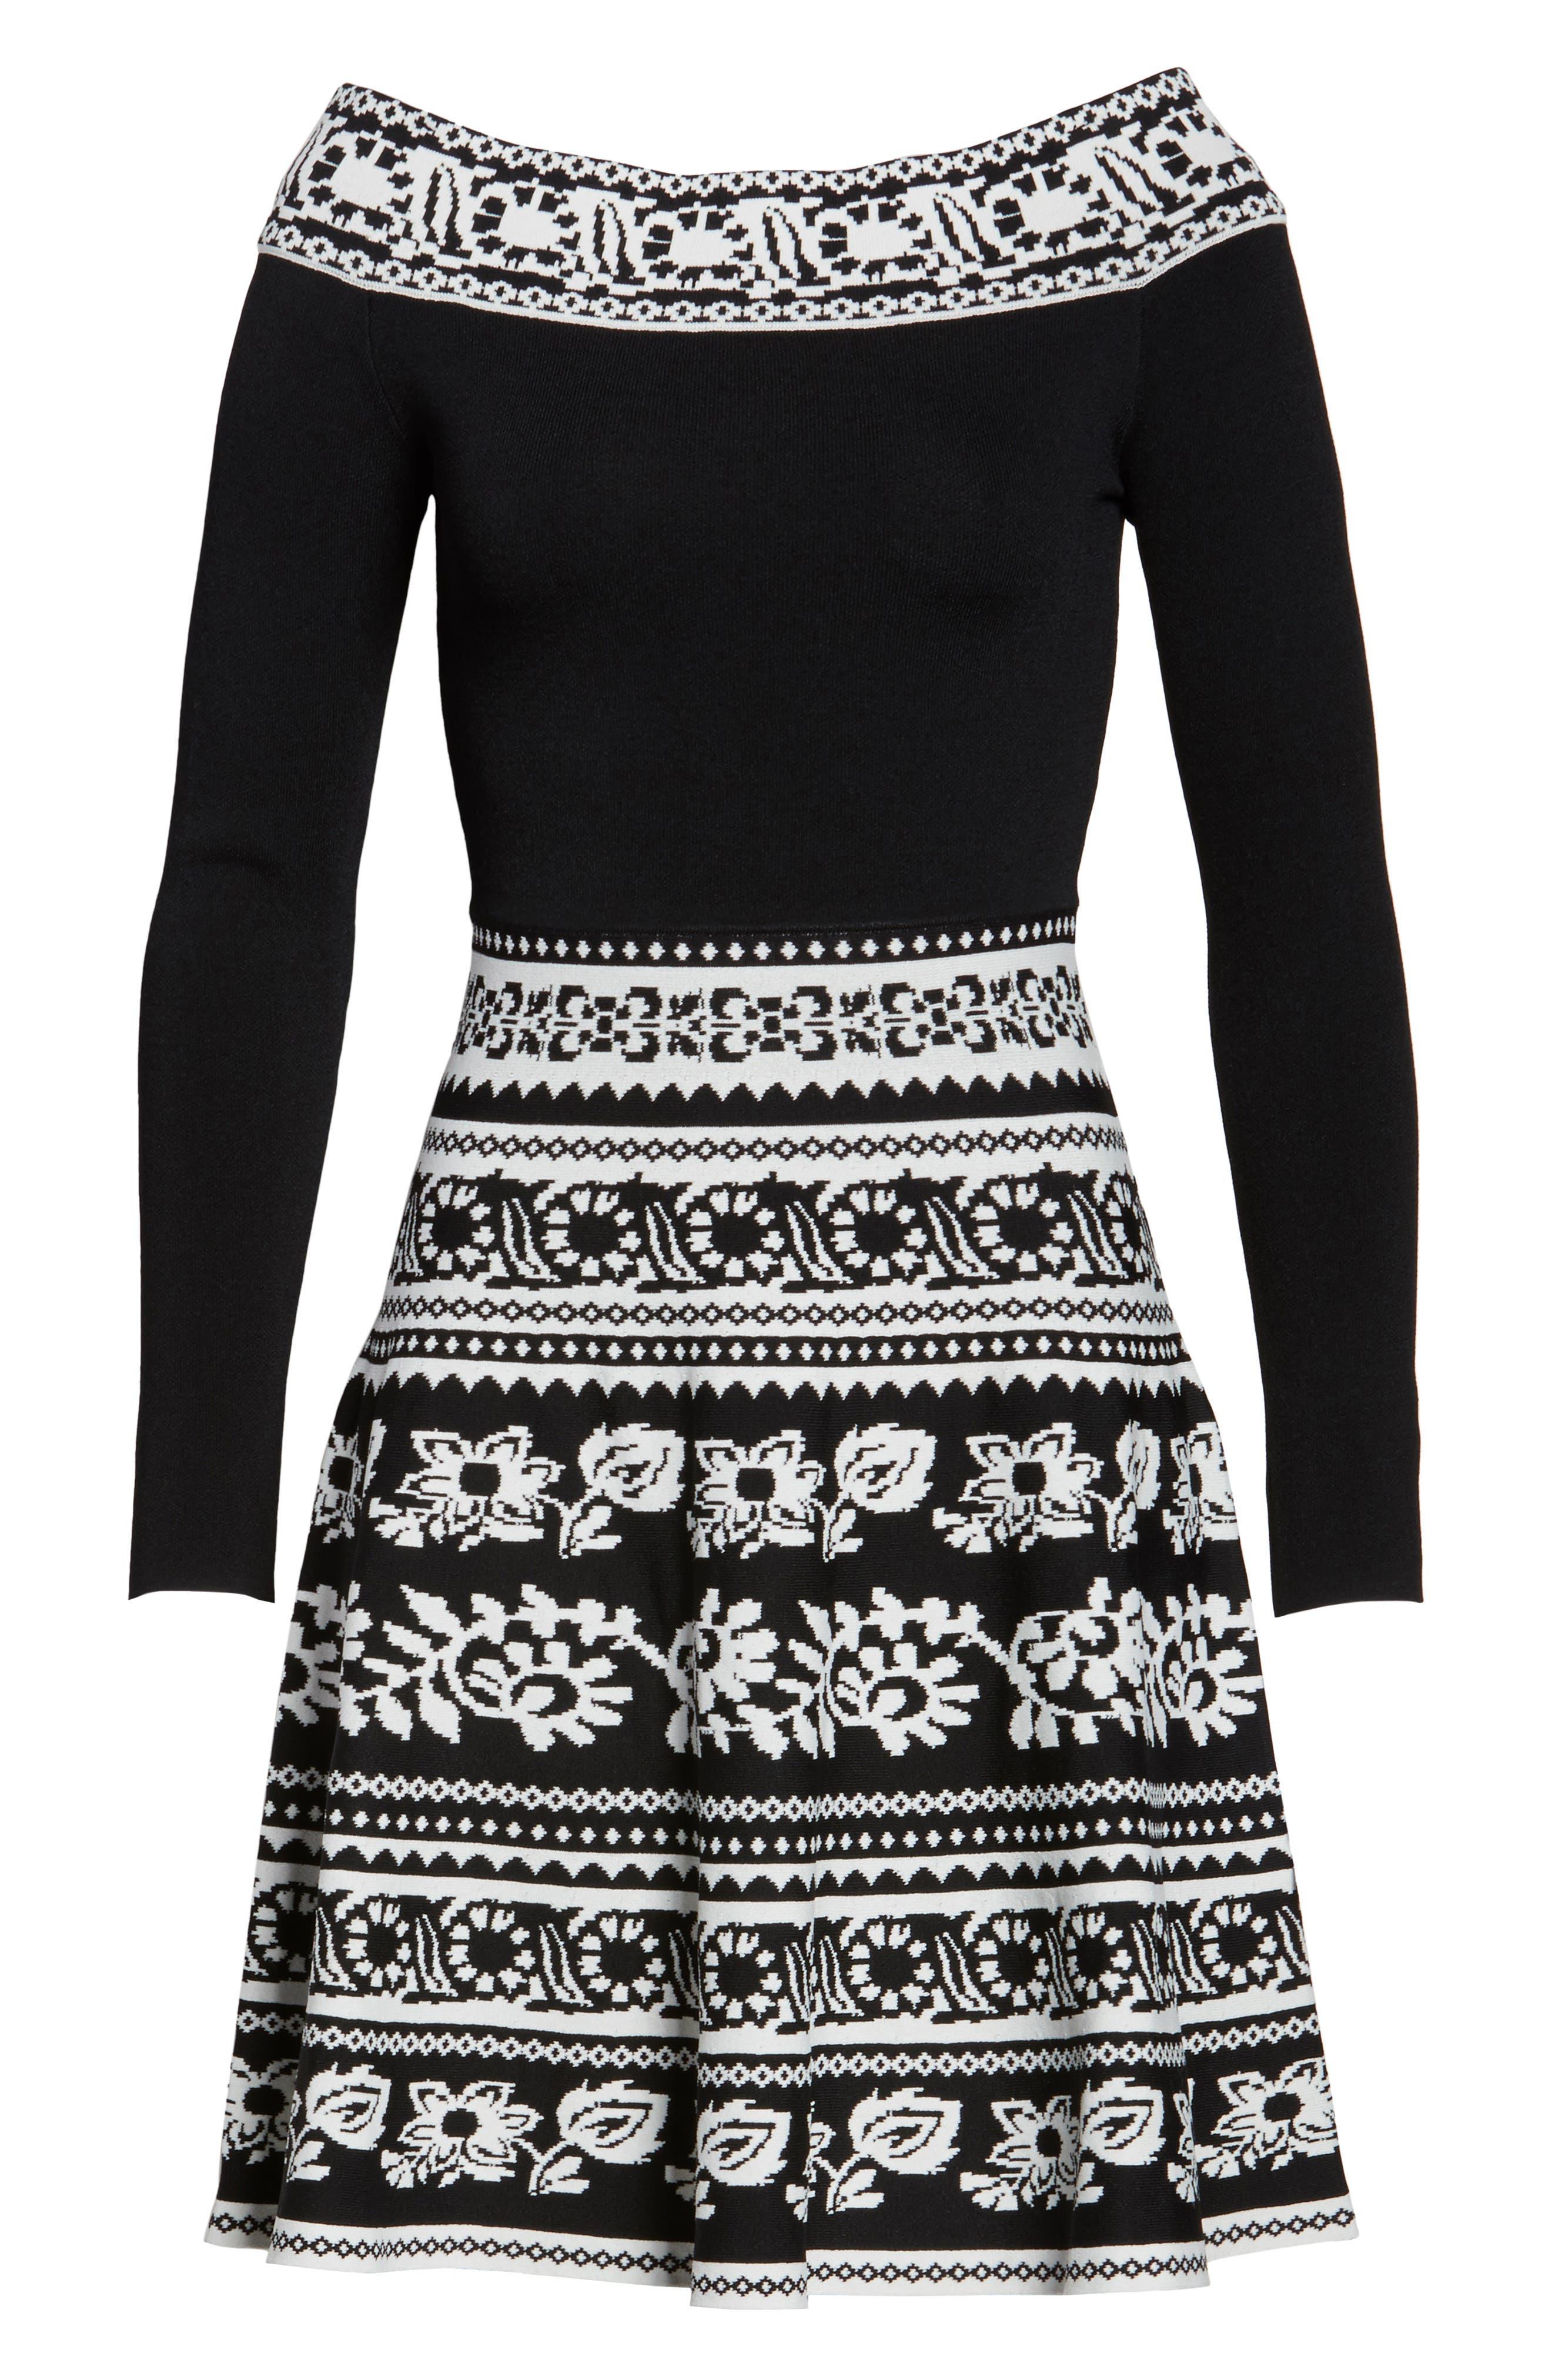 Pattern Off the Shoulder A-Line Knit Dress,                             Alternate thumbnail 6, color,                             012